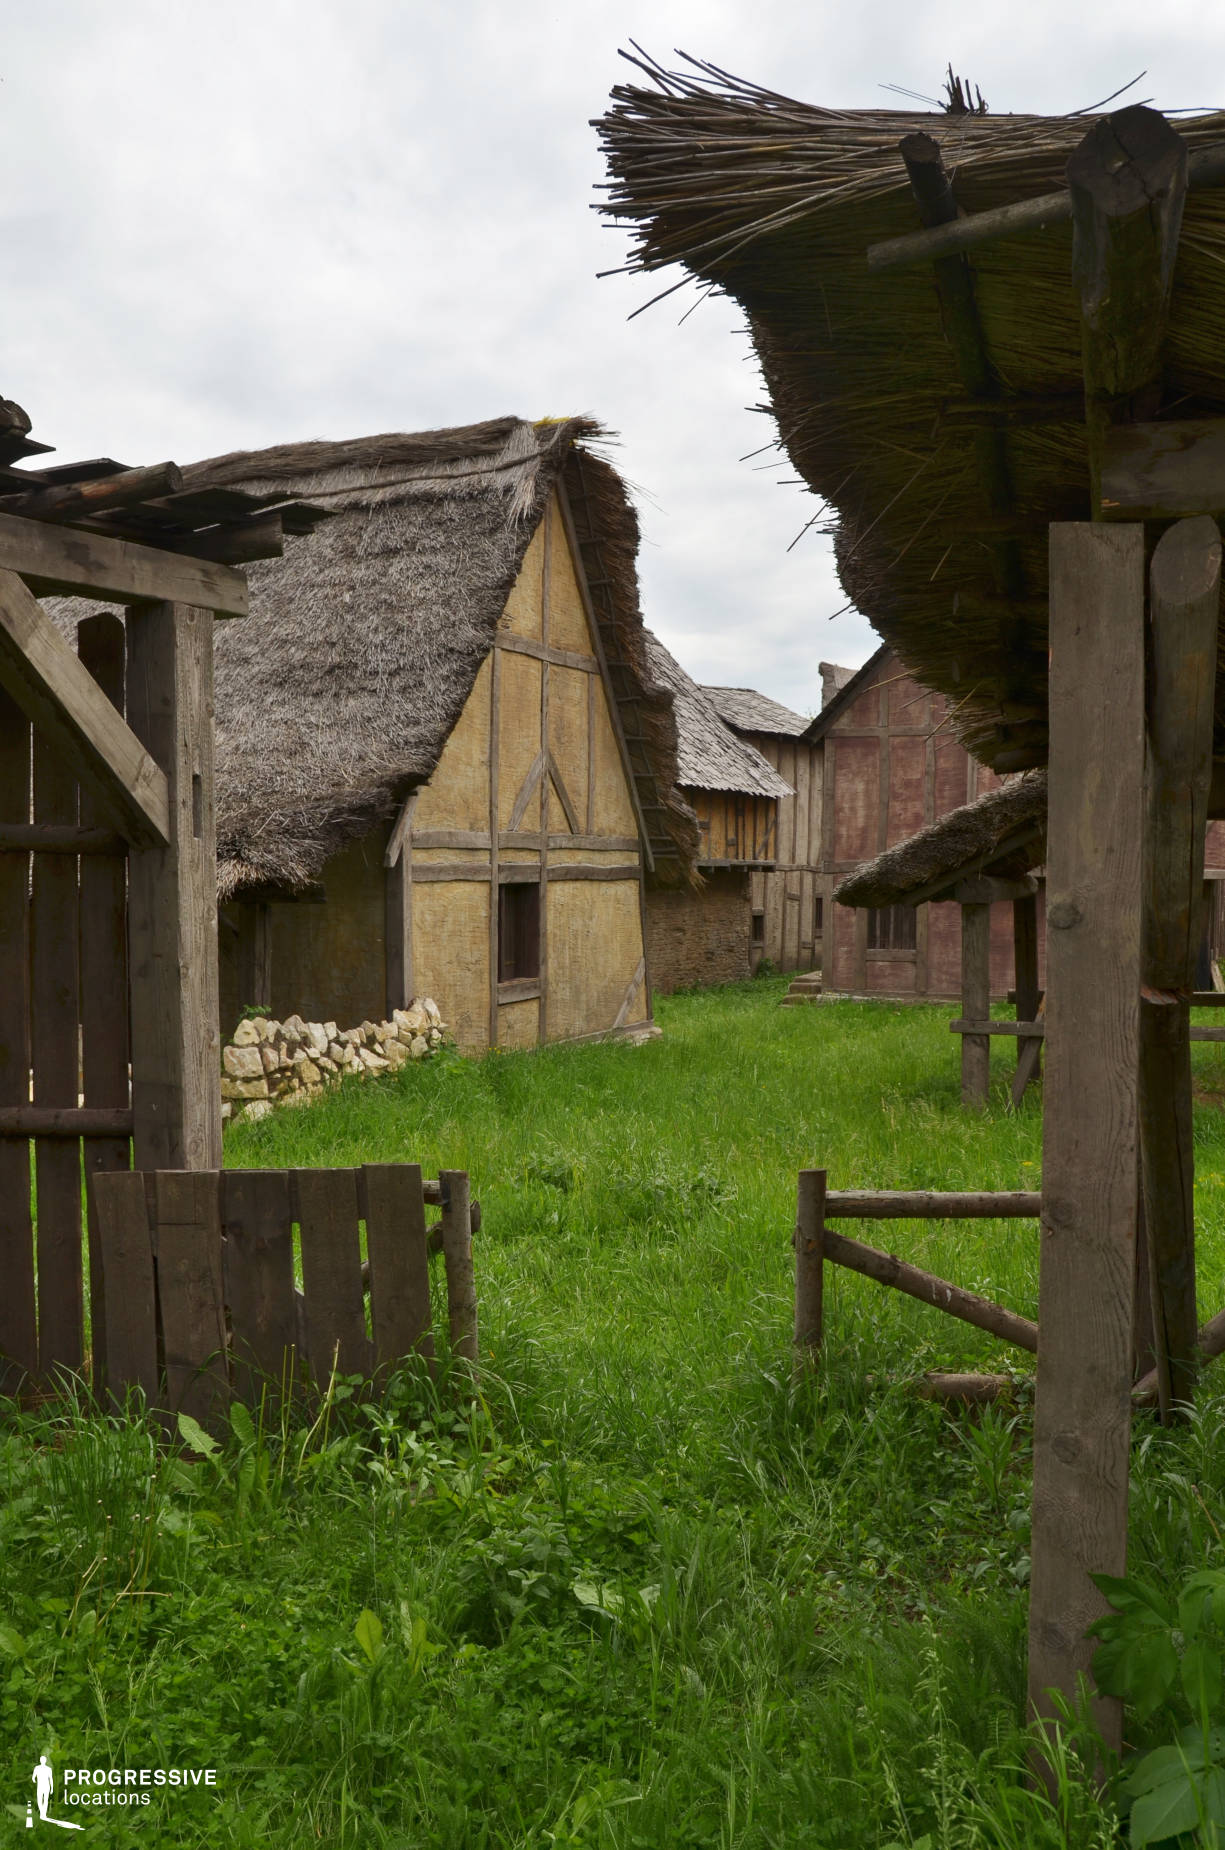 British Medieval Village Backlot: Backyard Stable